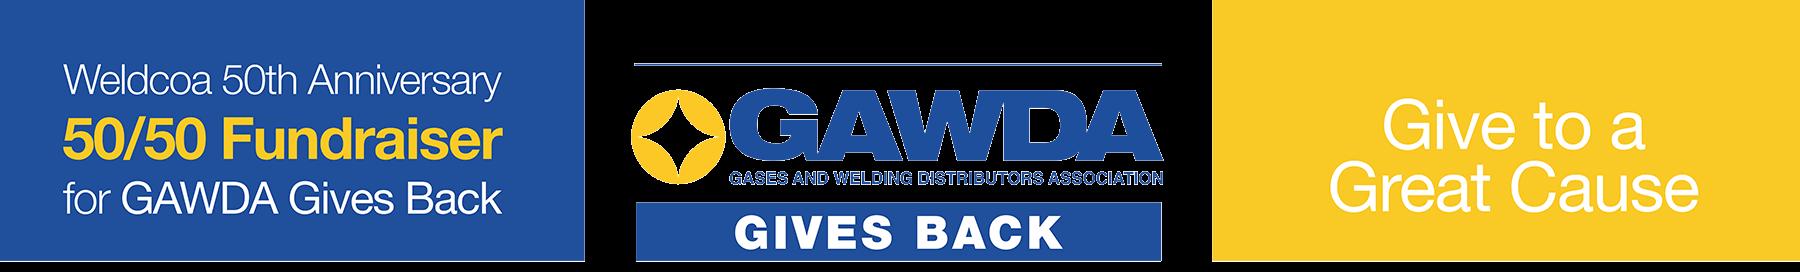 GAWDA-5050-Header.png